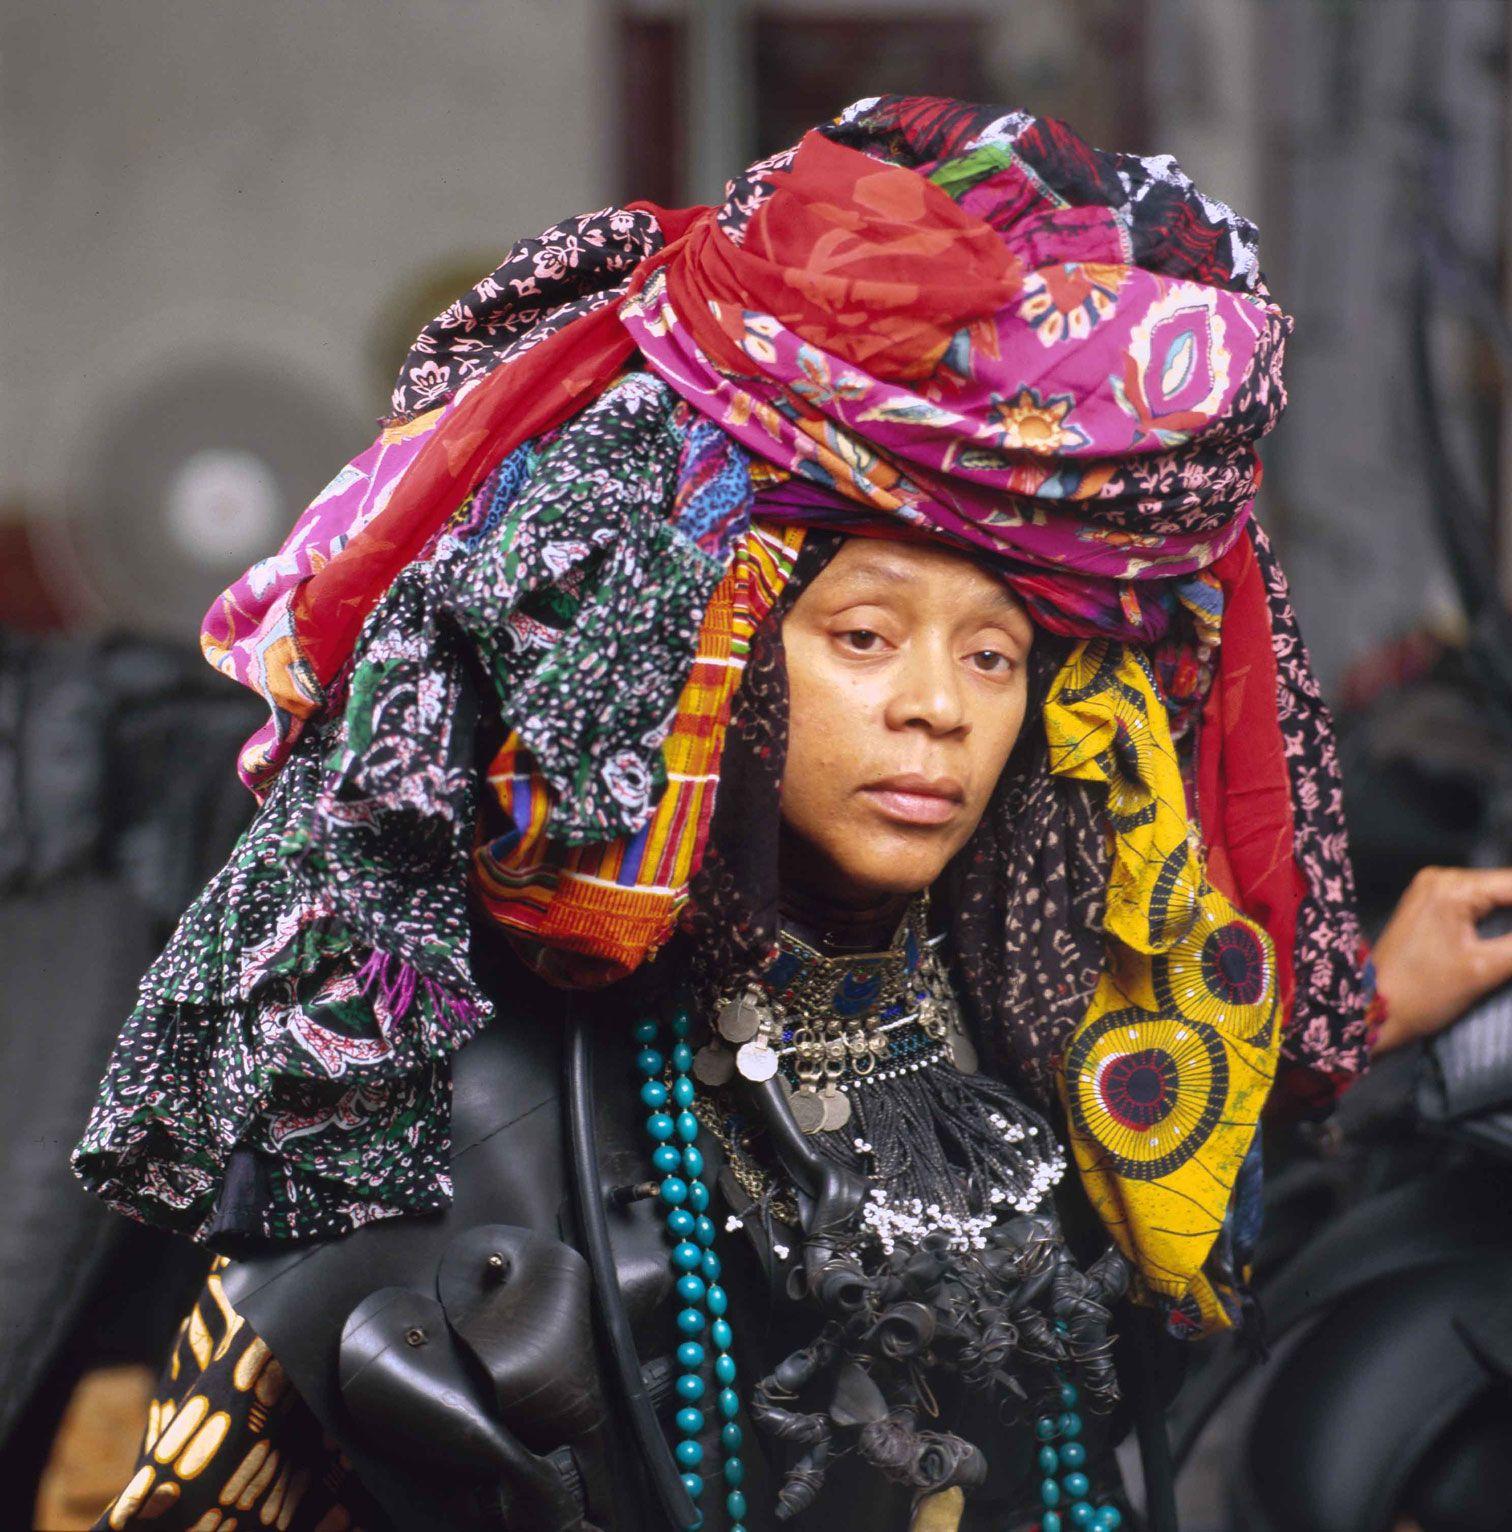 Chakaia booker contemporary artist who creates large